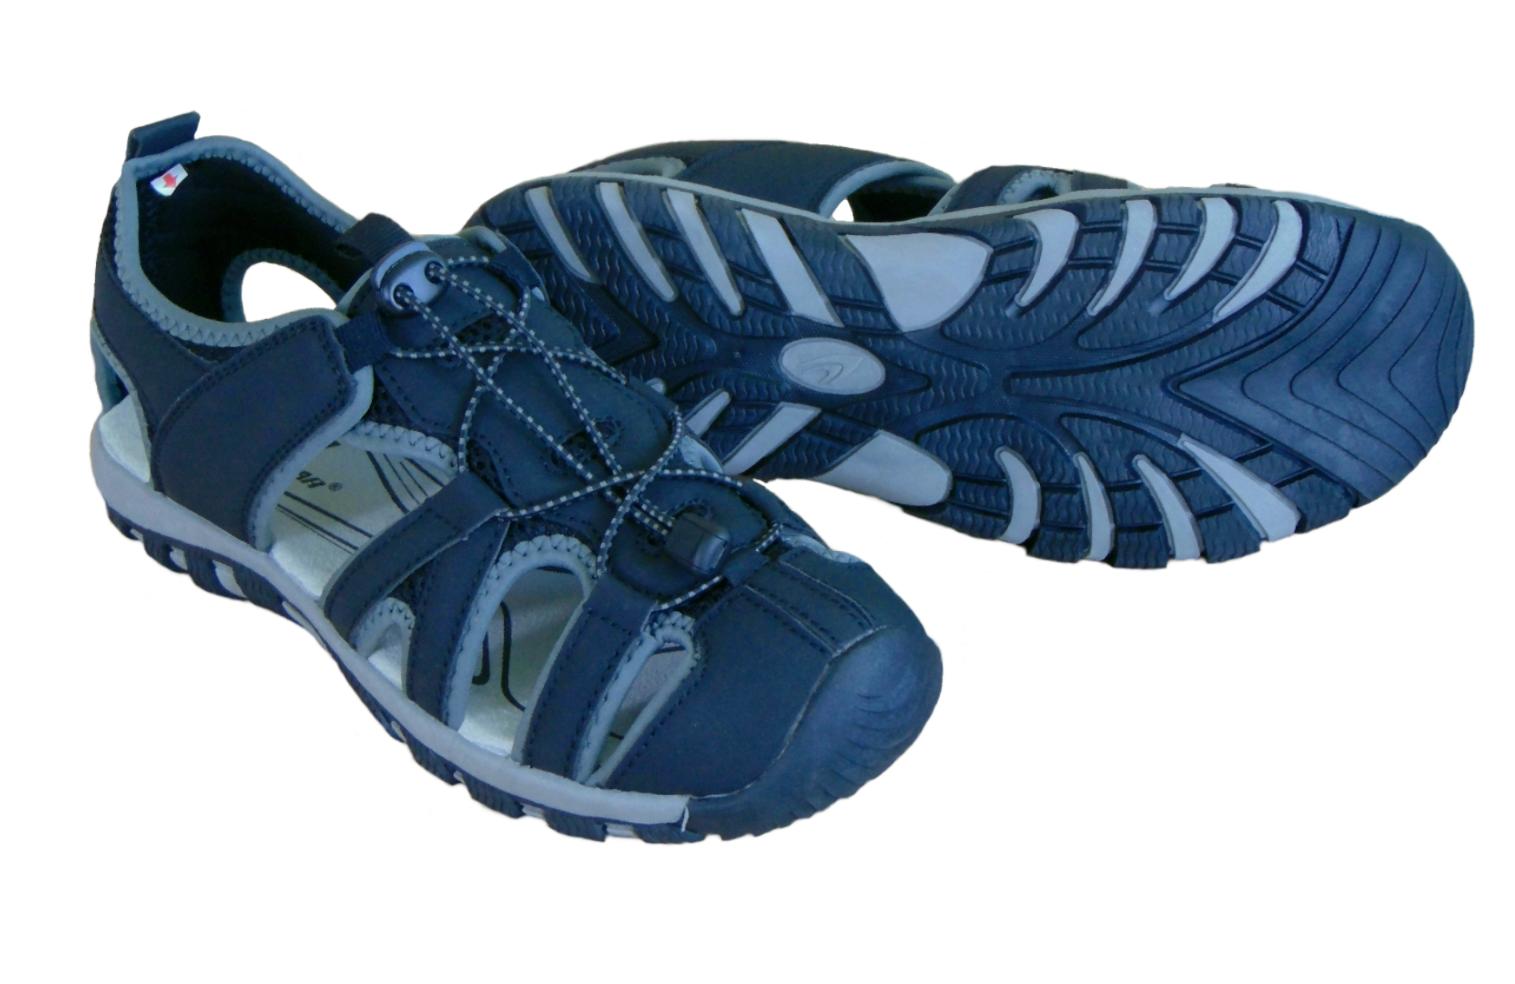 Herren Sandale SandaletteTrekking Outdoor Freizeitschuhe Sportschuhe